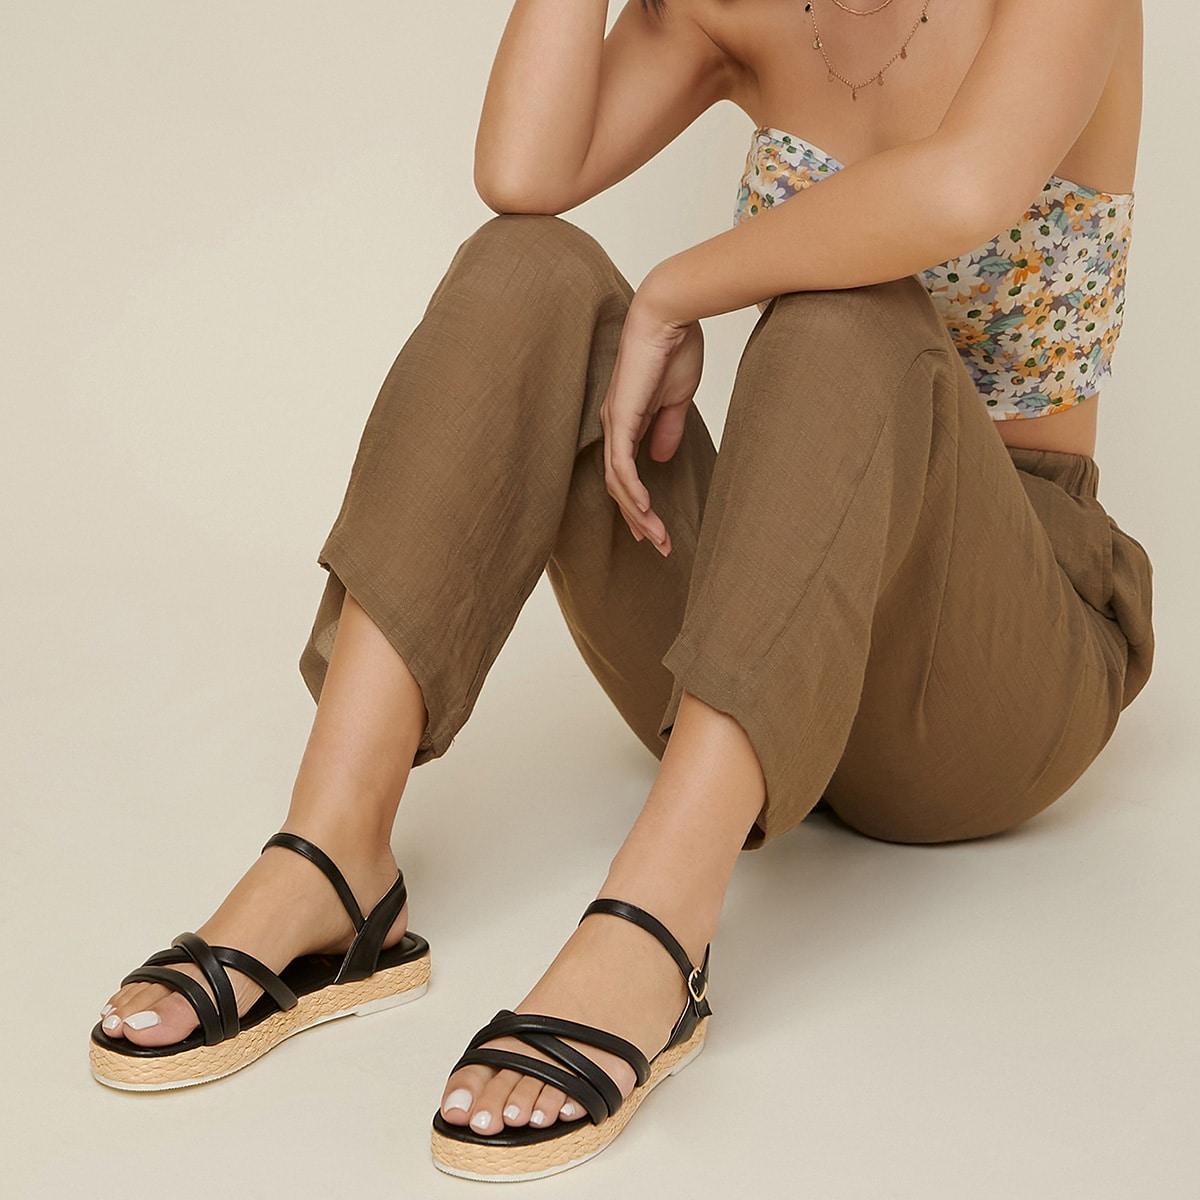 SHEIN / Crisscross Strap Faux Leather Ankle Strap Sandals